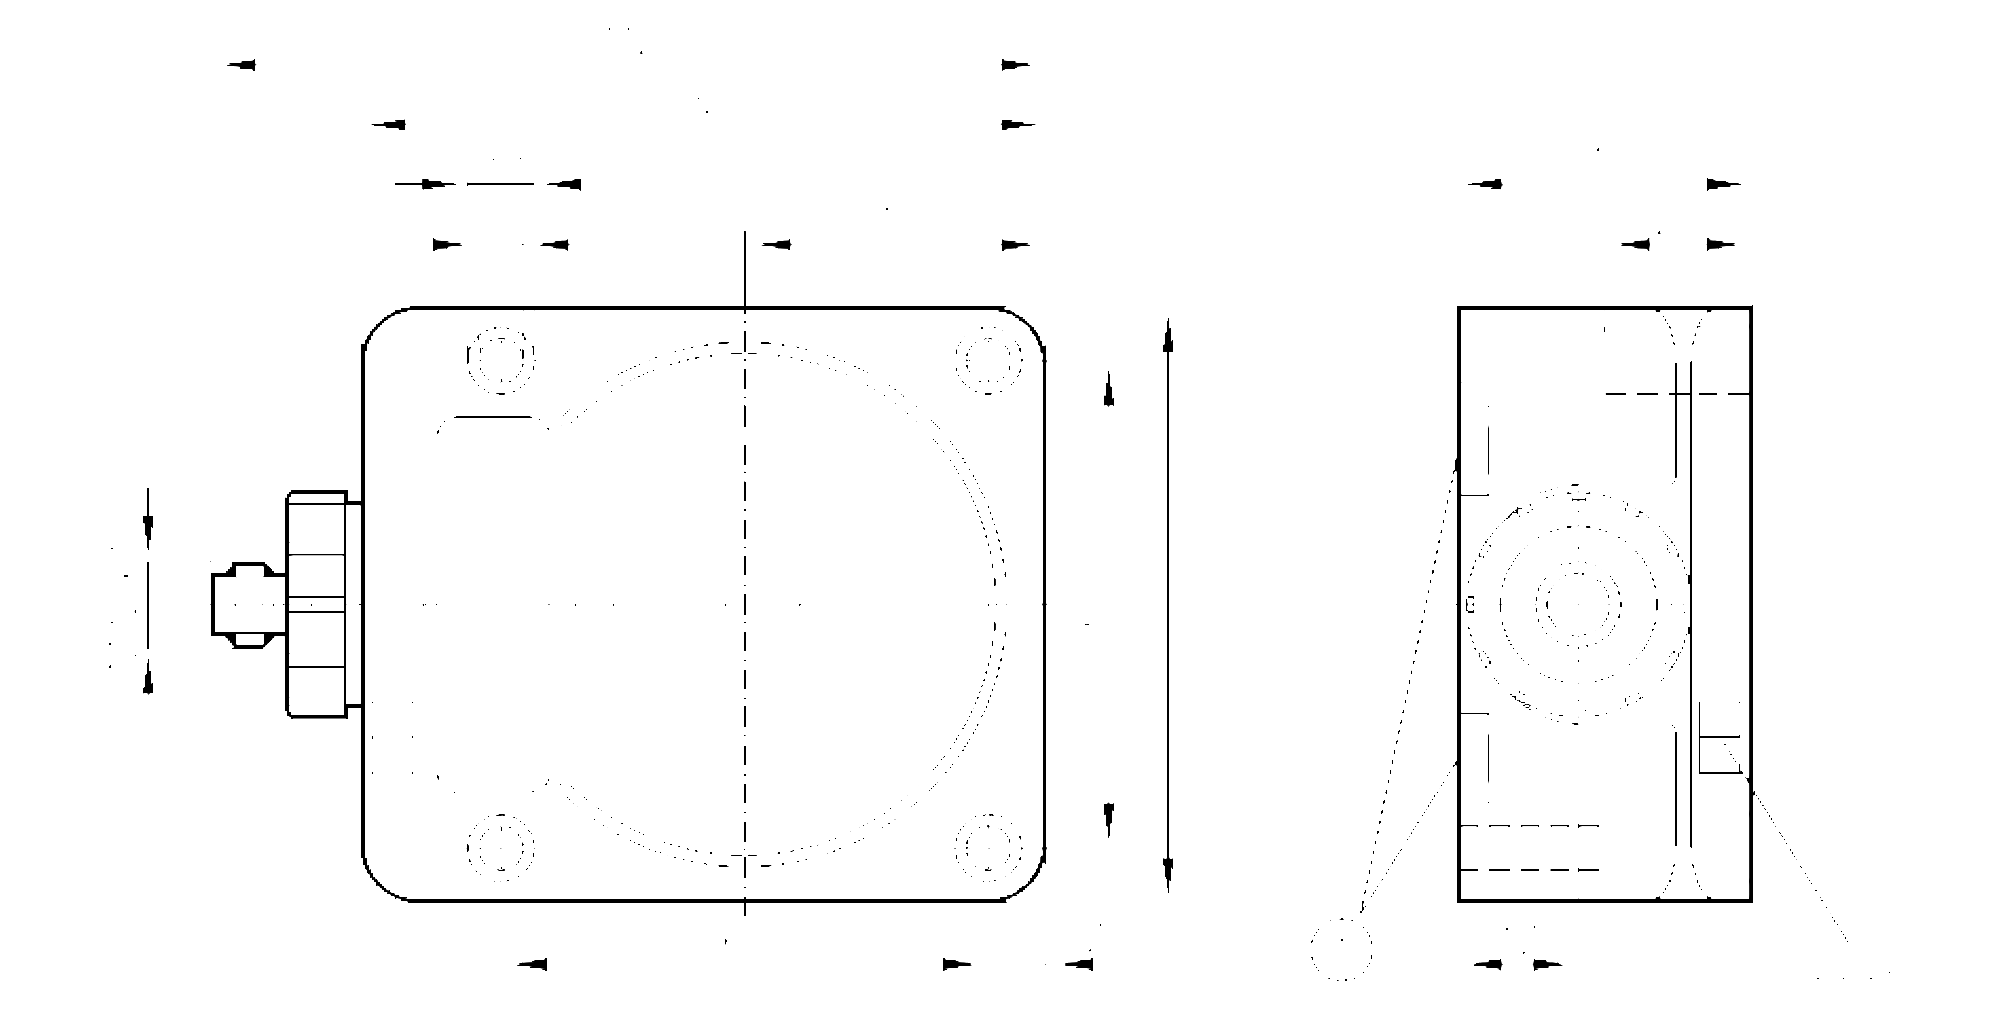 id5058 - inductive sensor